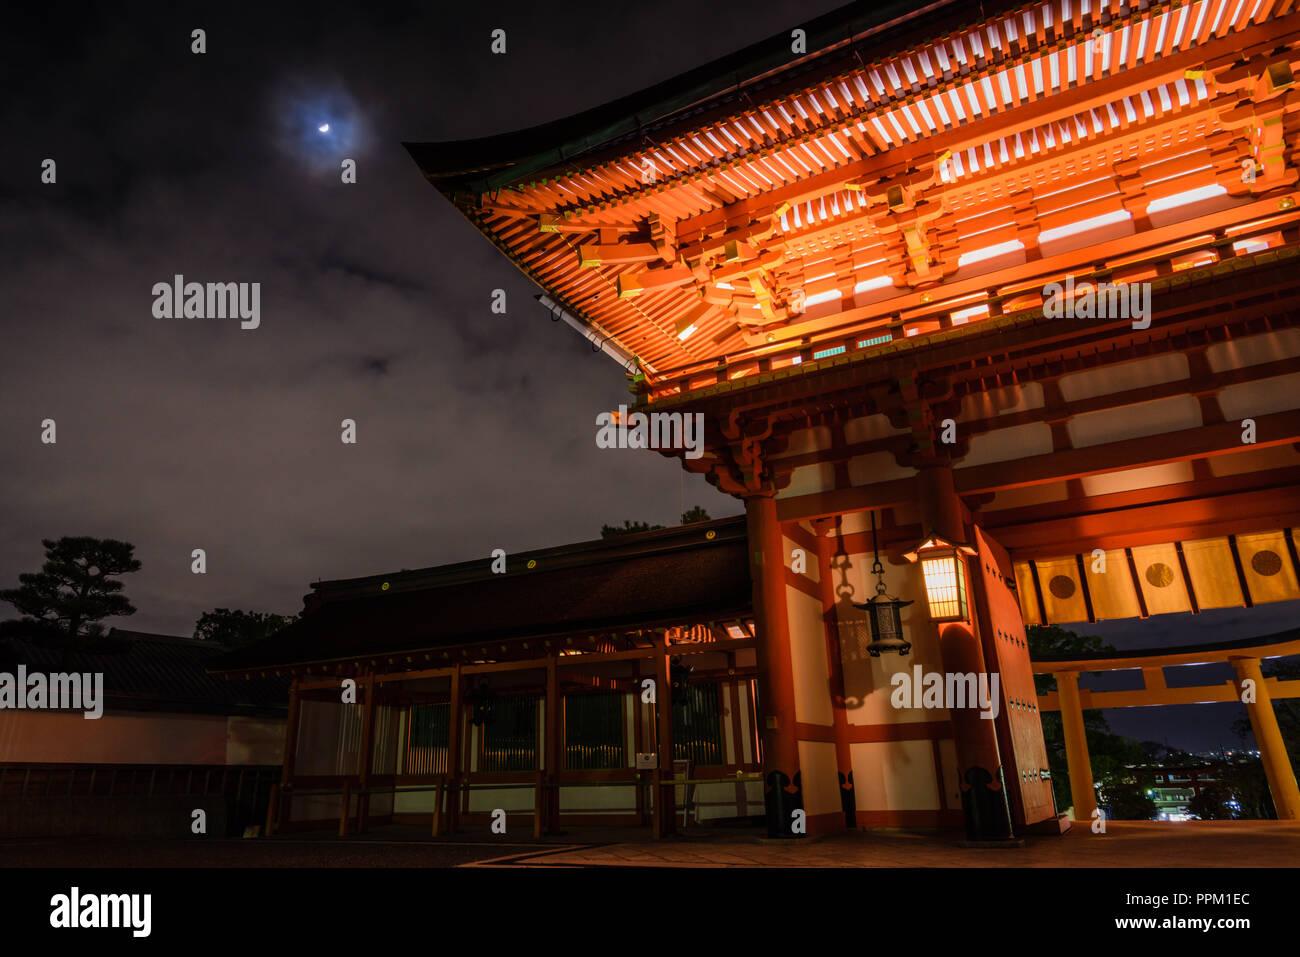 Fushimi Inari shrine in Kyoto lit up at night - Stock Image